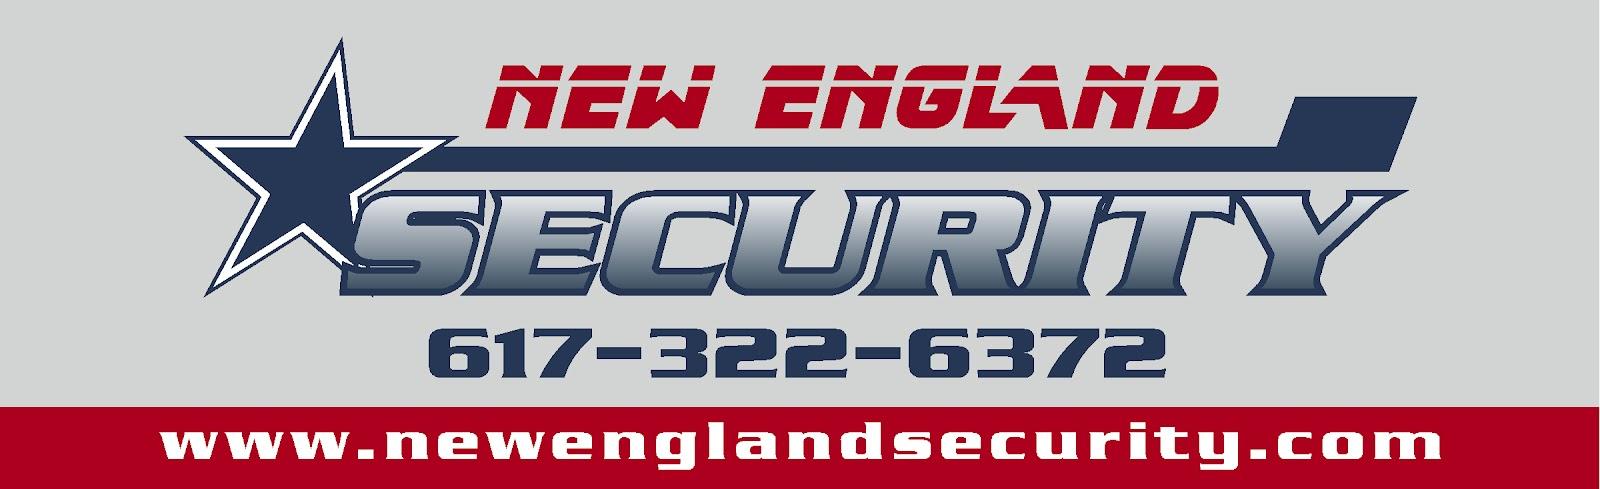 New England England Security Services New England